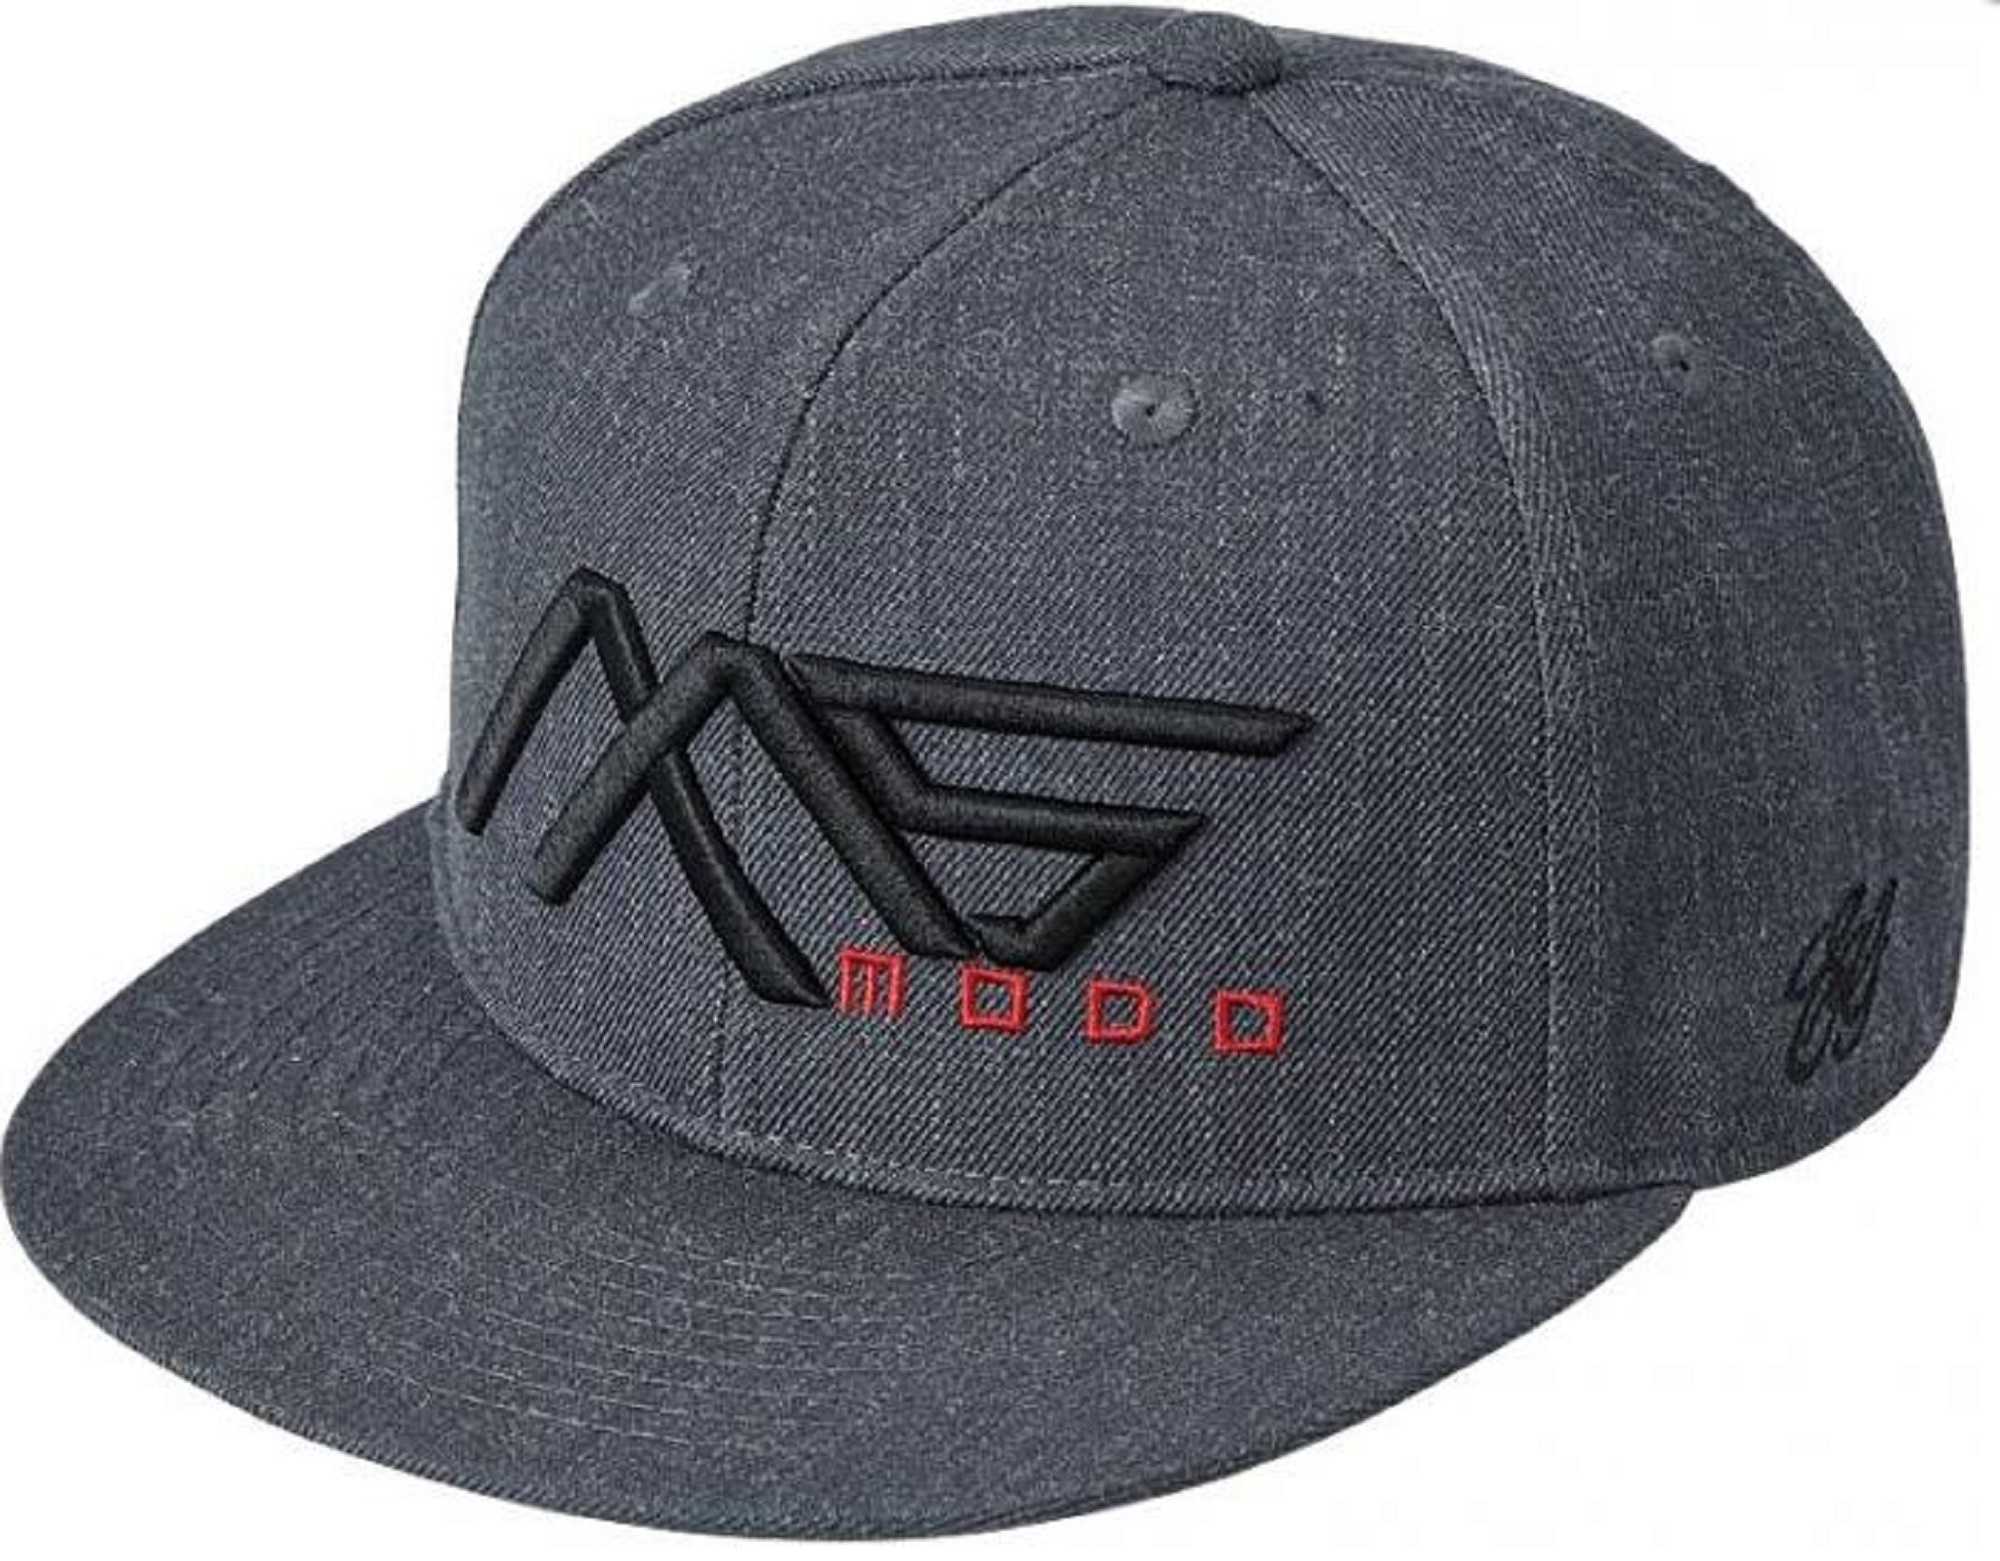 Evergreen Cap Flat Cap MS-Modo Japan Free Size Gray (3138)